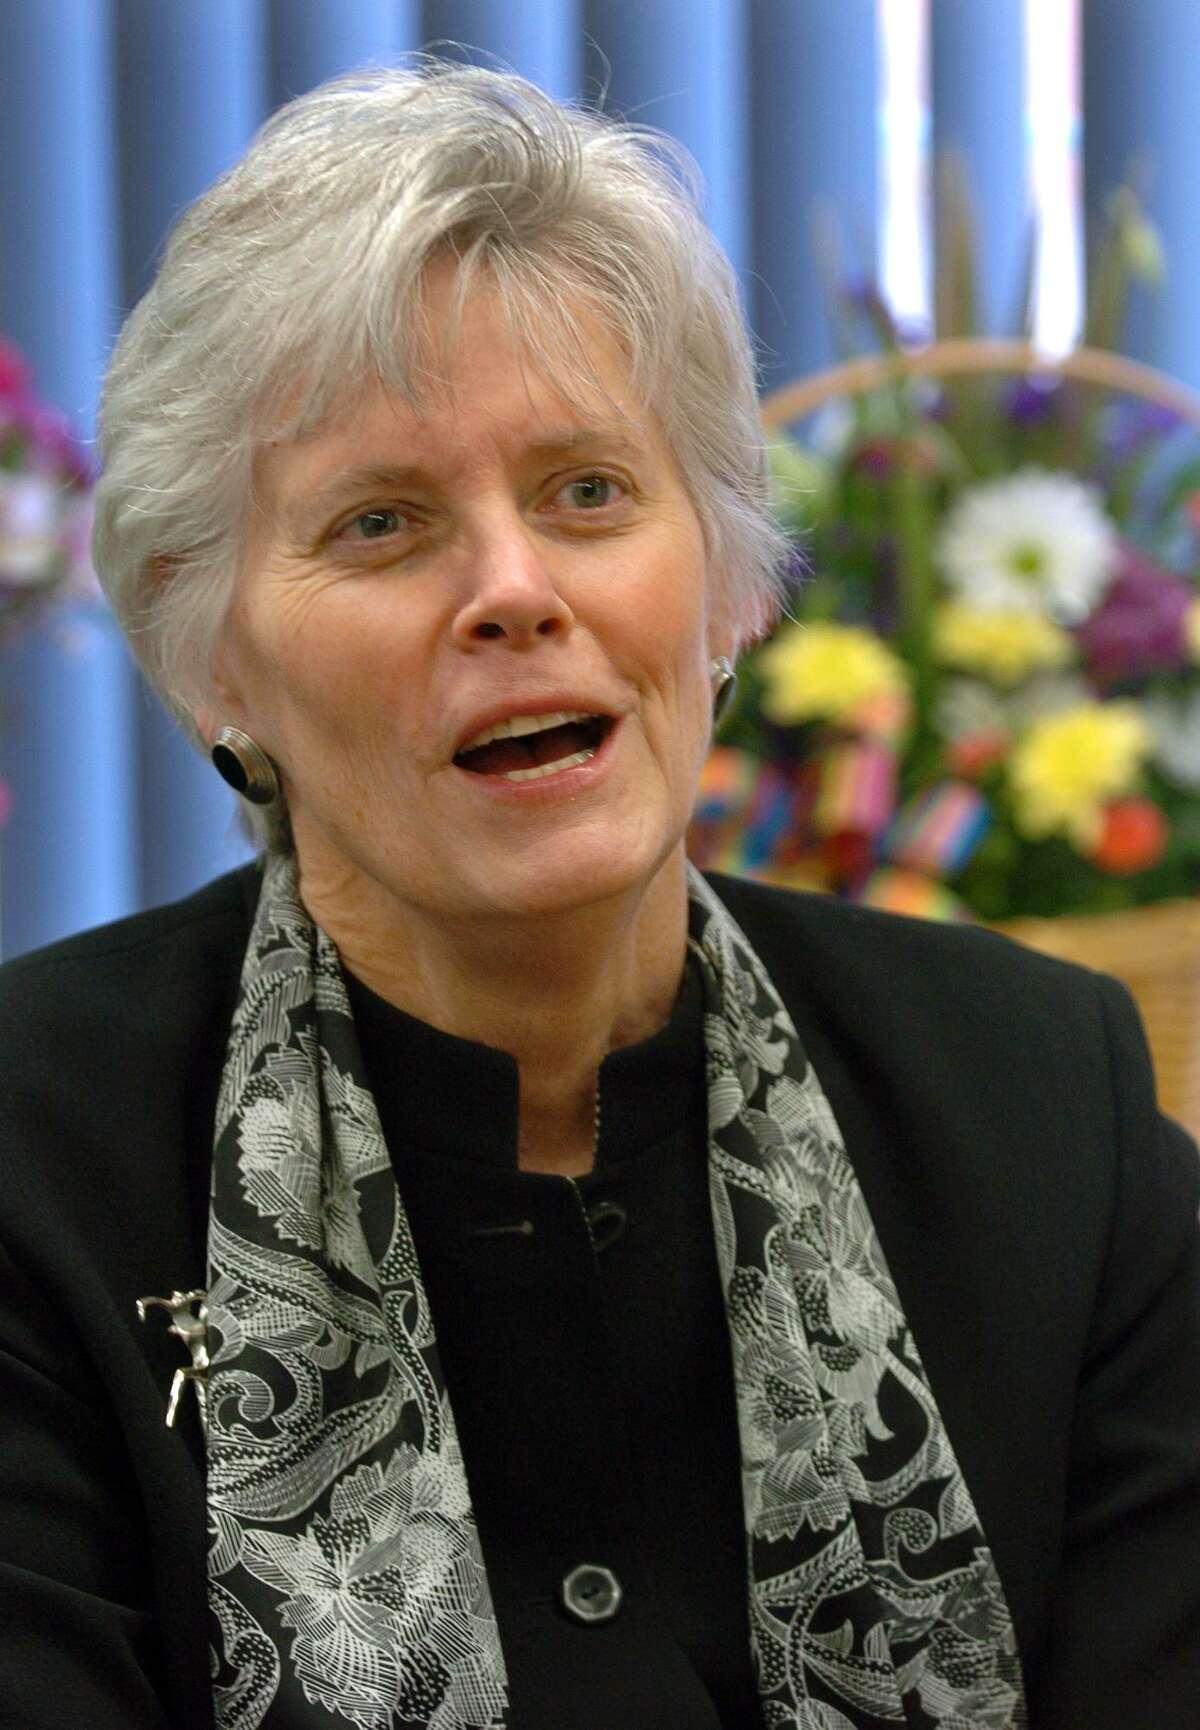 Elizabeth Feser, Milford's Superintendent of Schools, on Wednesday April 6, 2011. File photo.